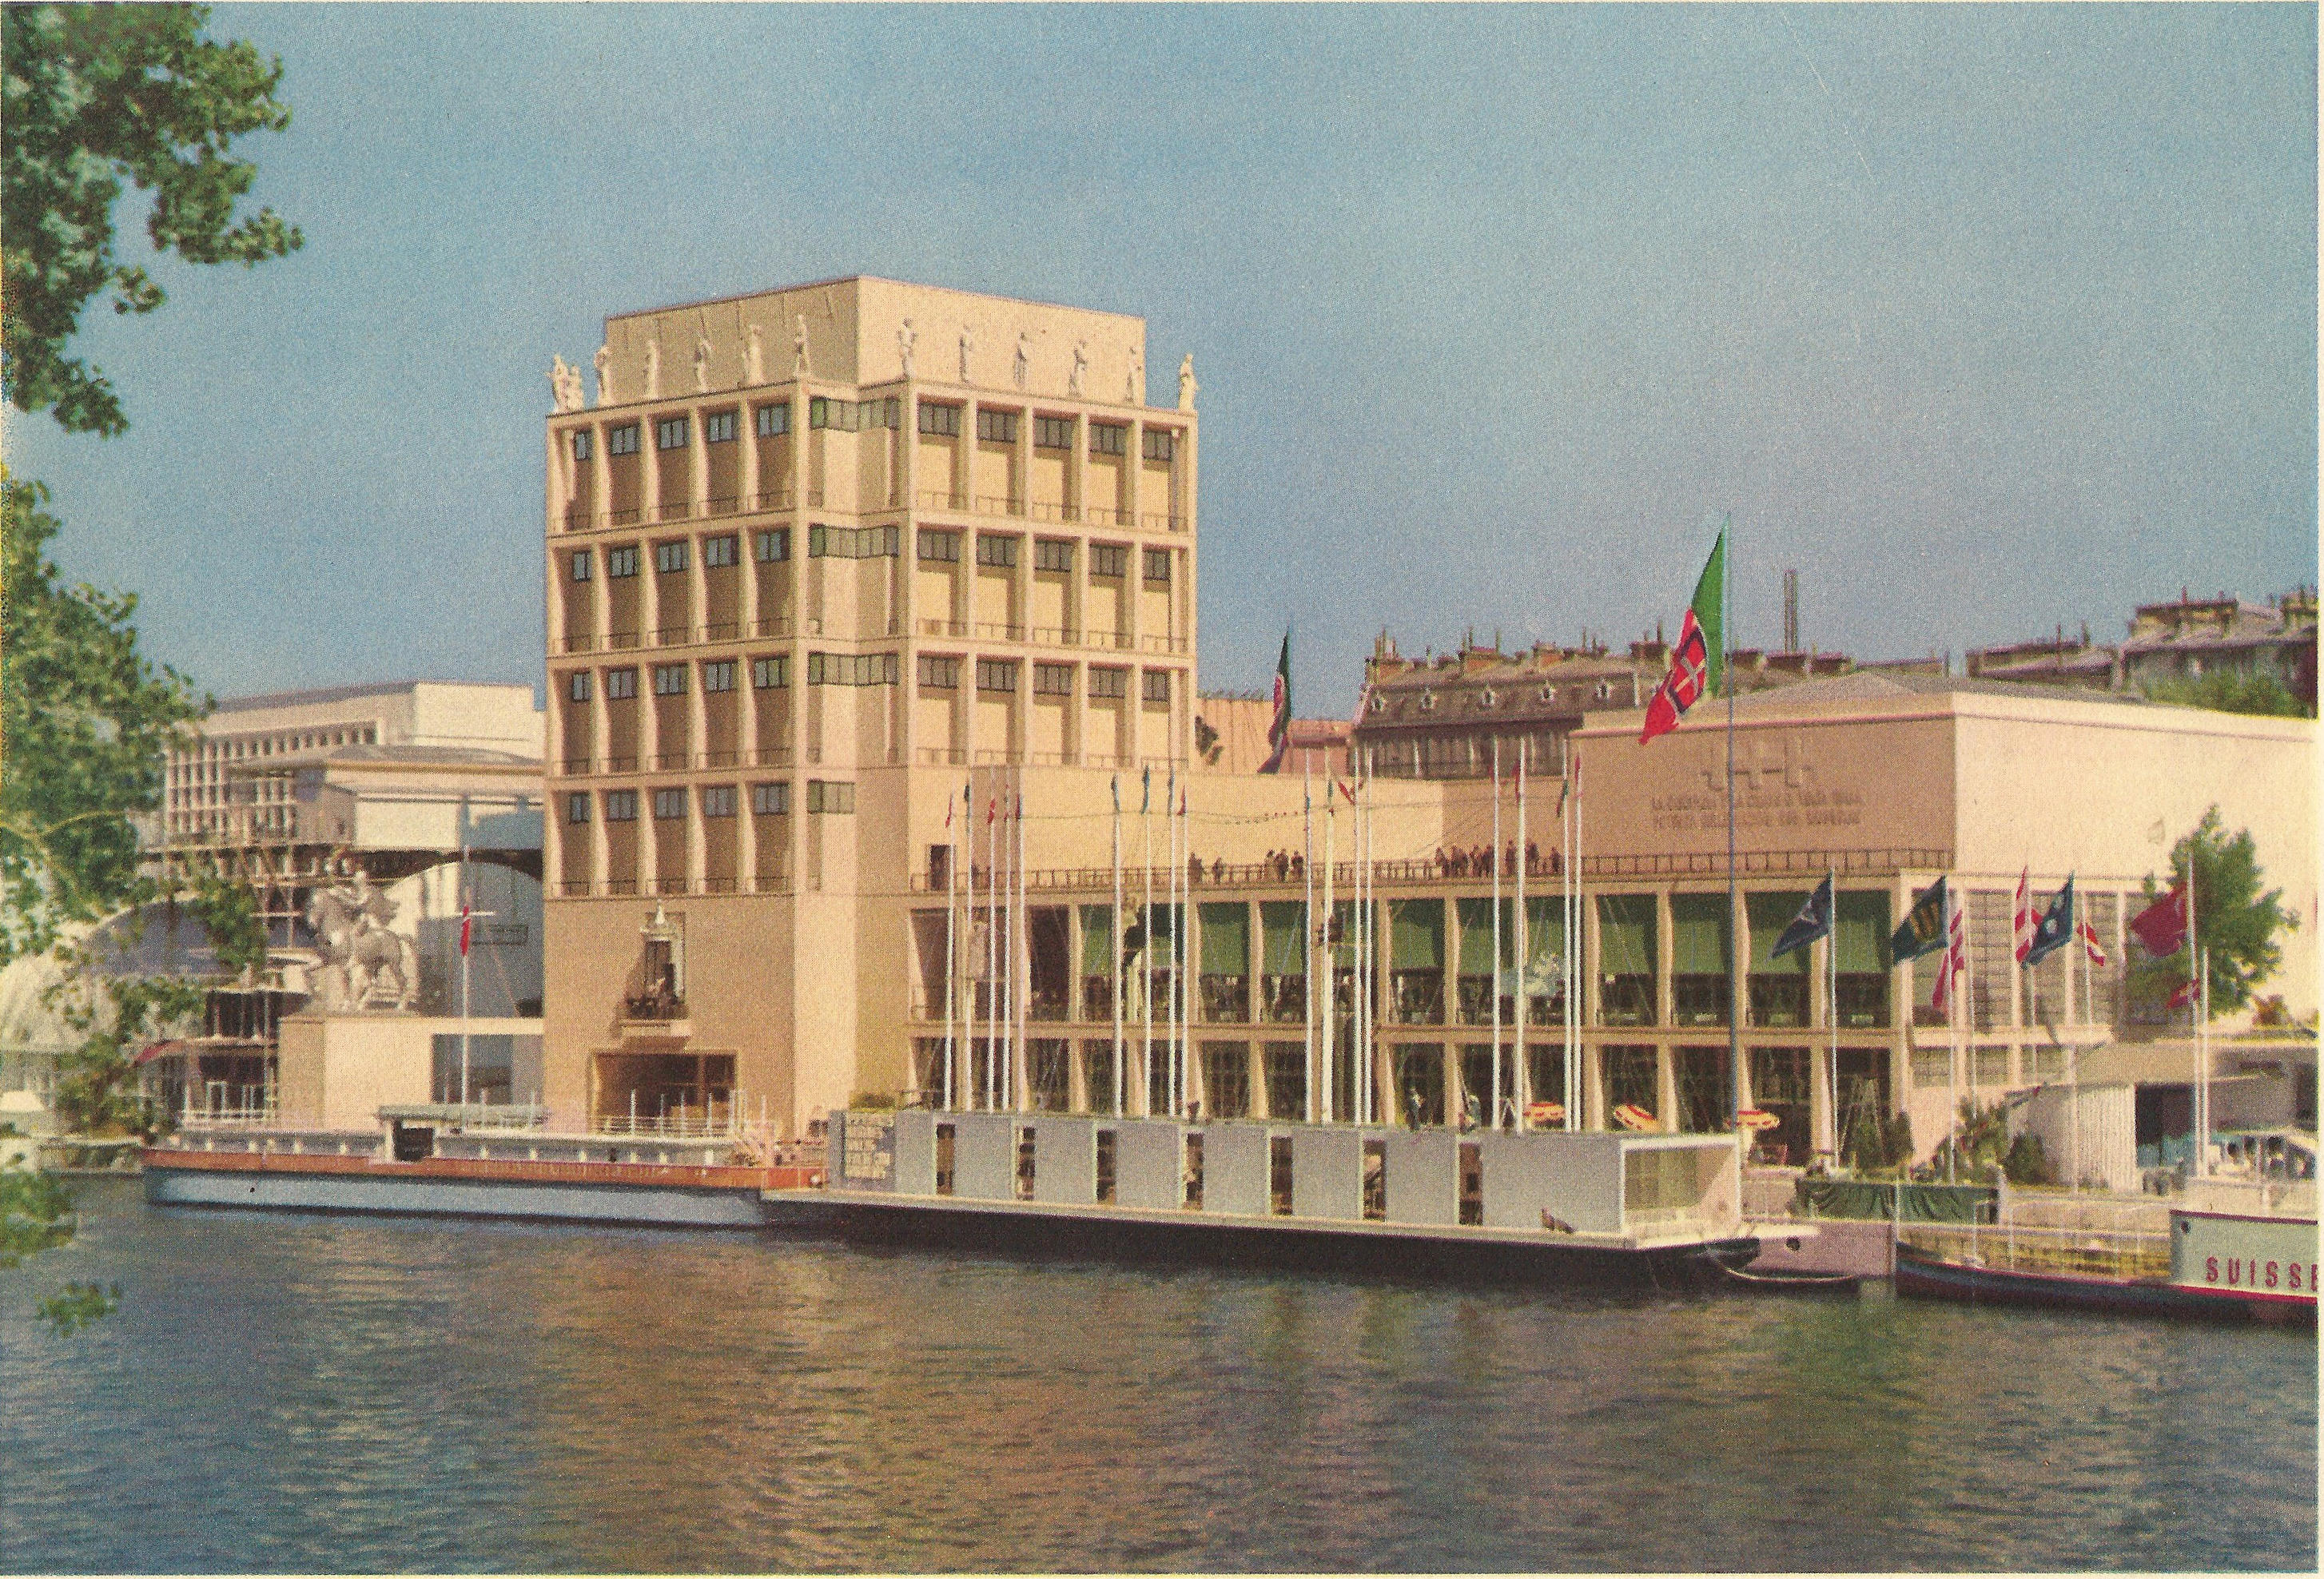 Pavillon De La Reine Hotel